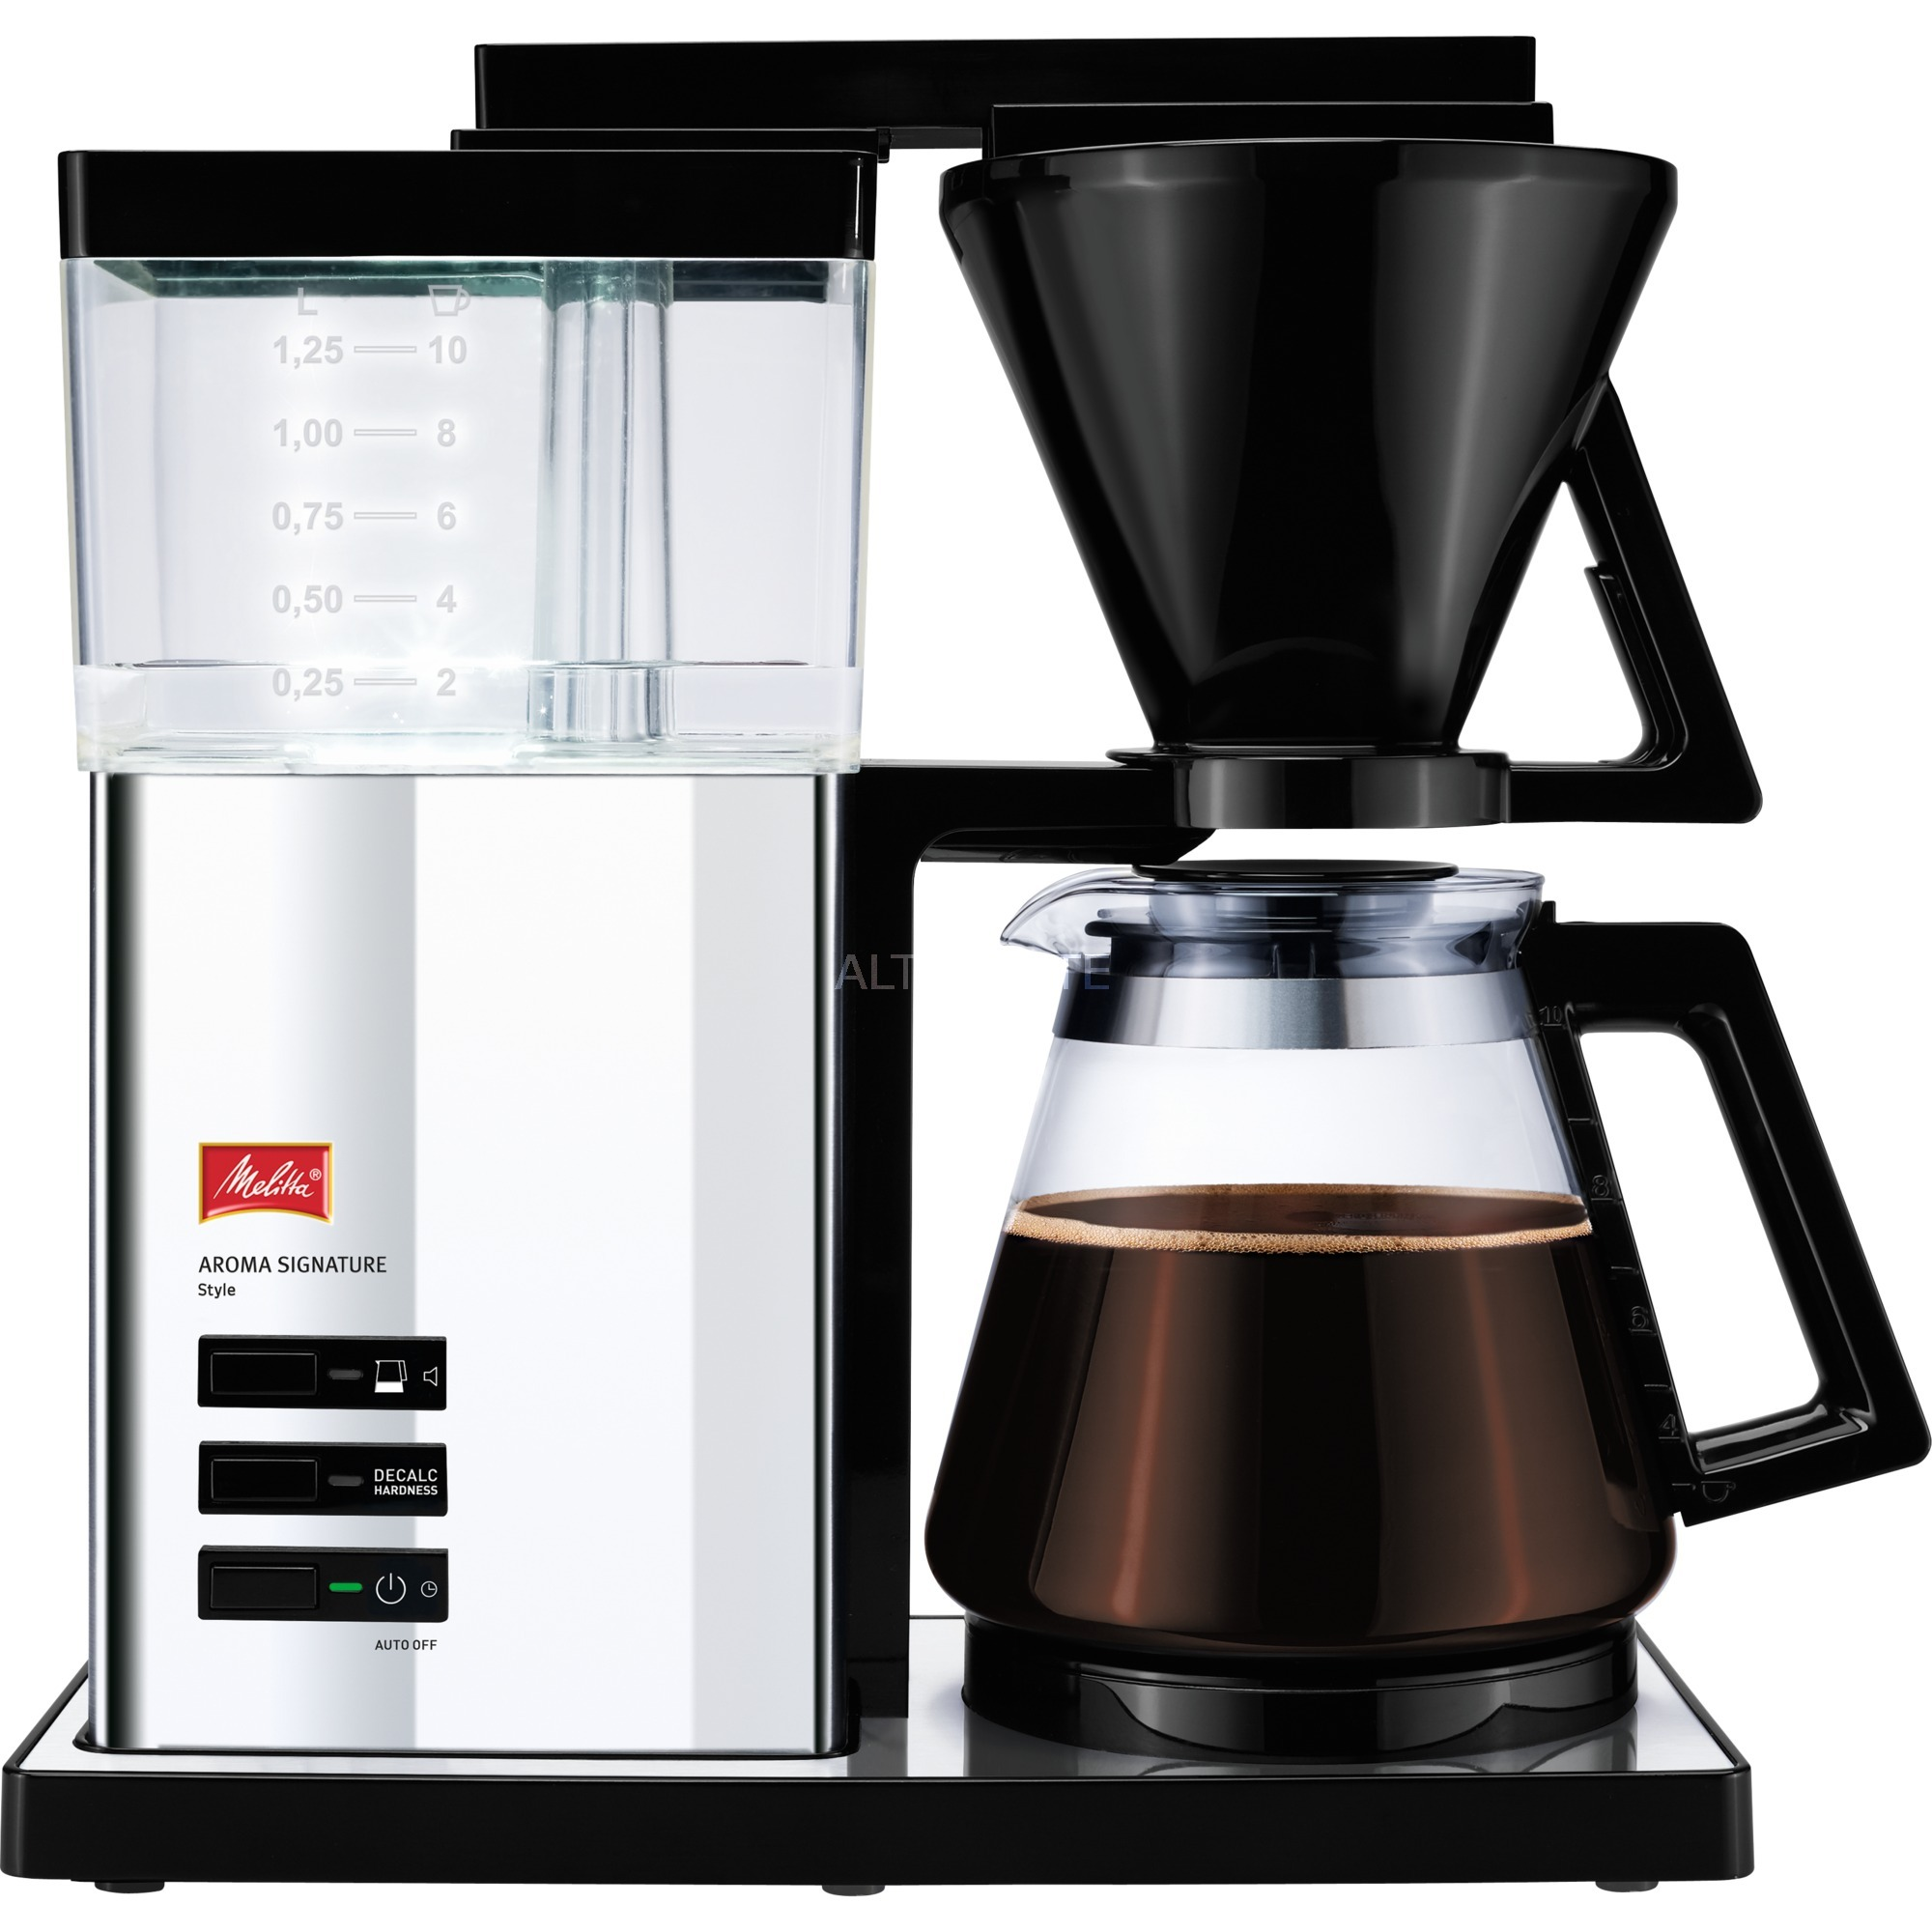 aroma-signature-style-fritstaaende-semi-auto-draabe-kaffemaskine-125l-10kopper-sort-solv-filter-maskine